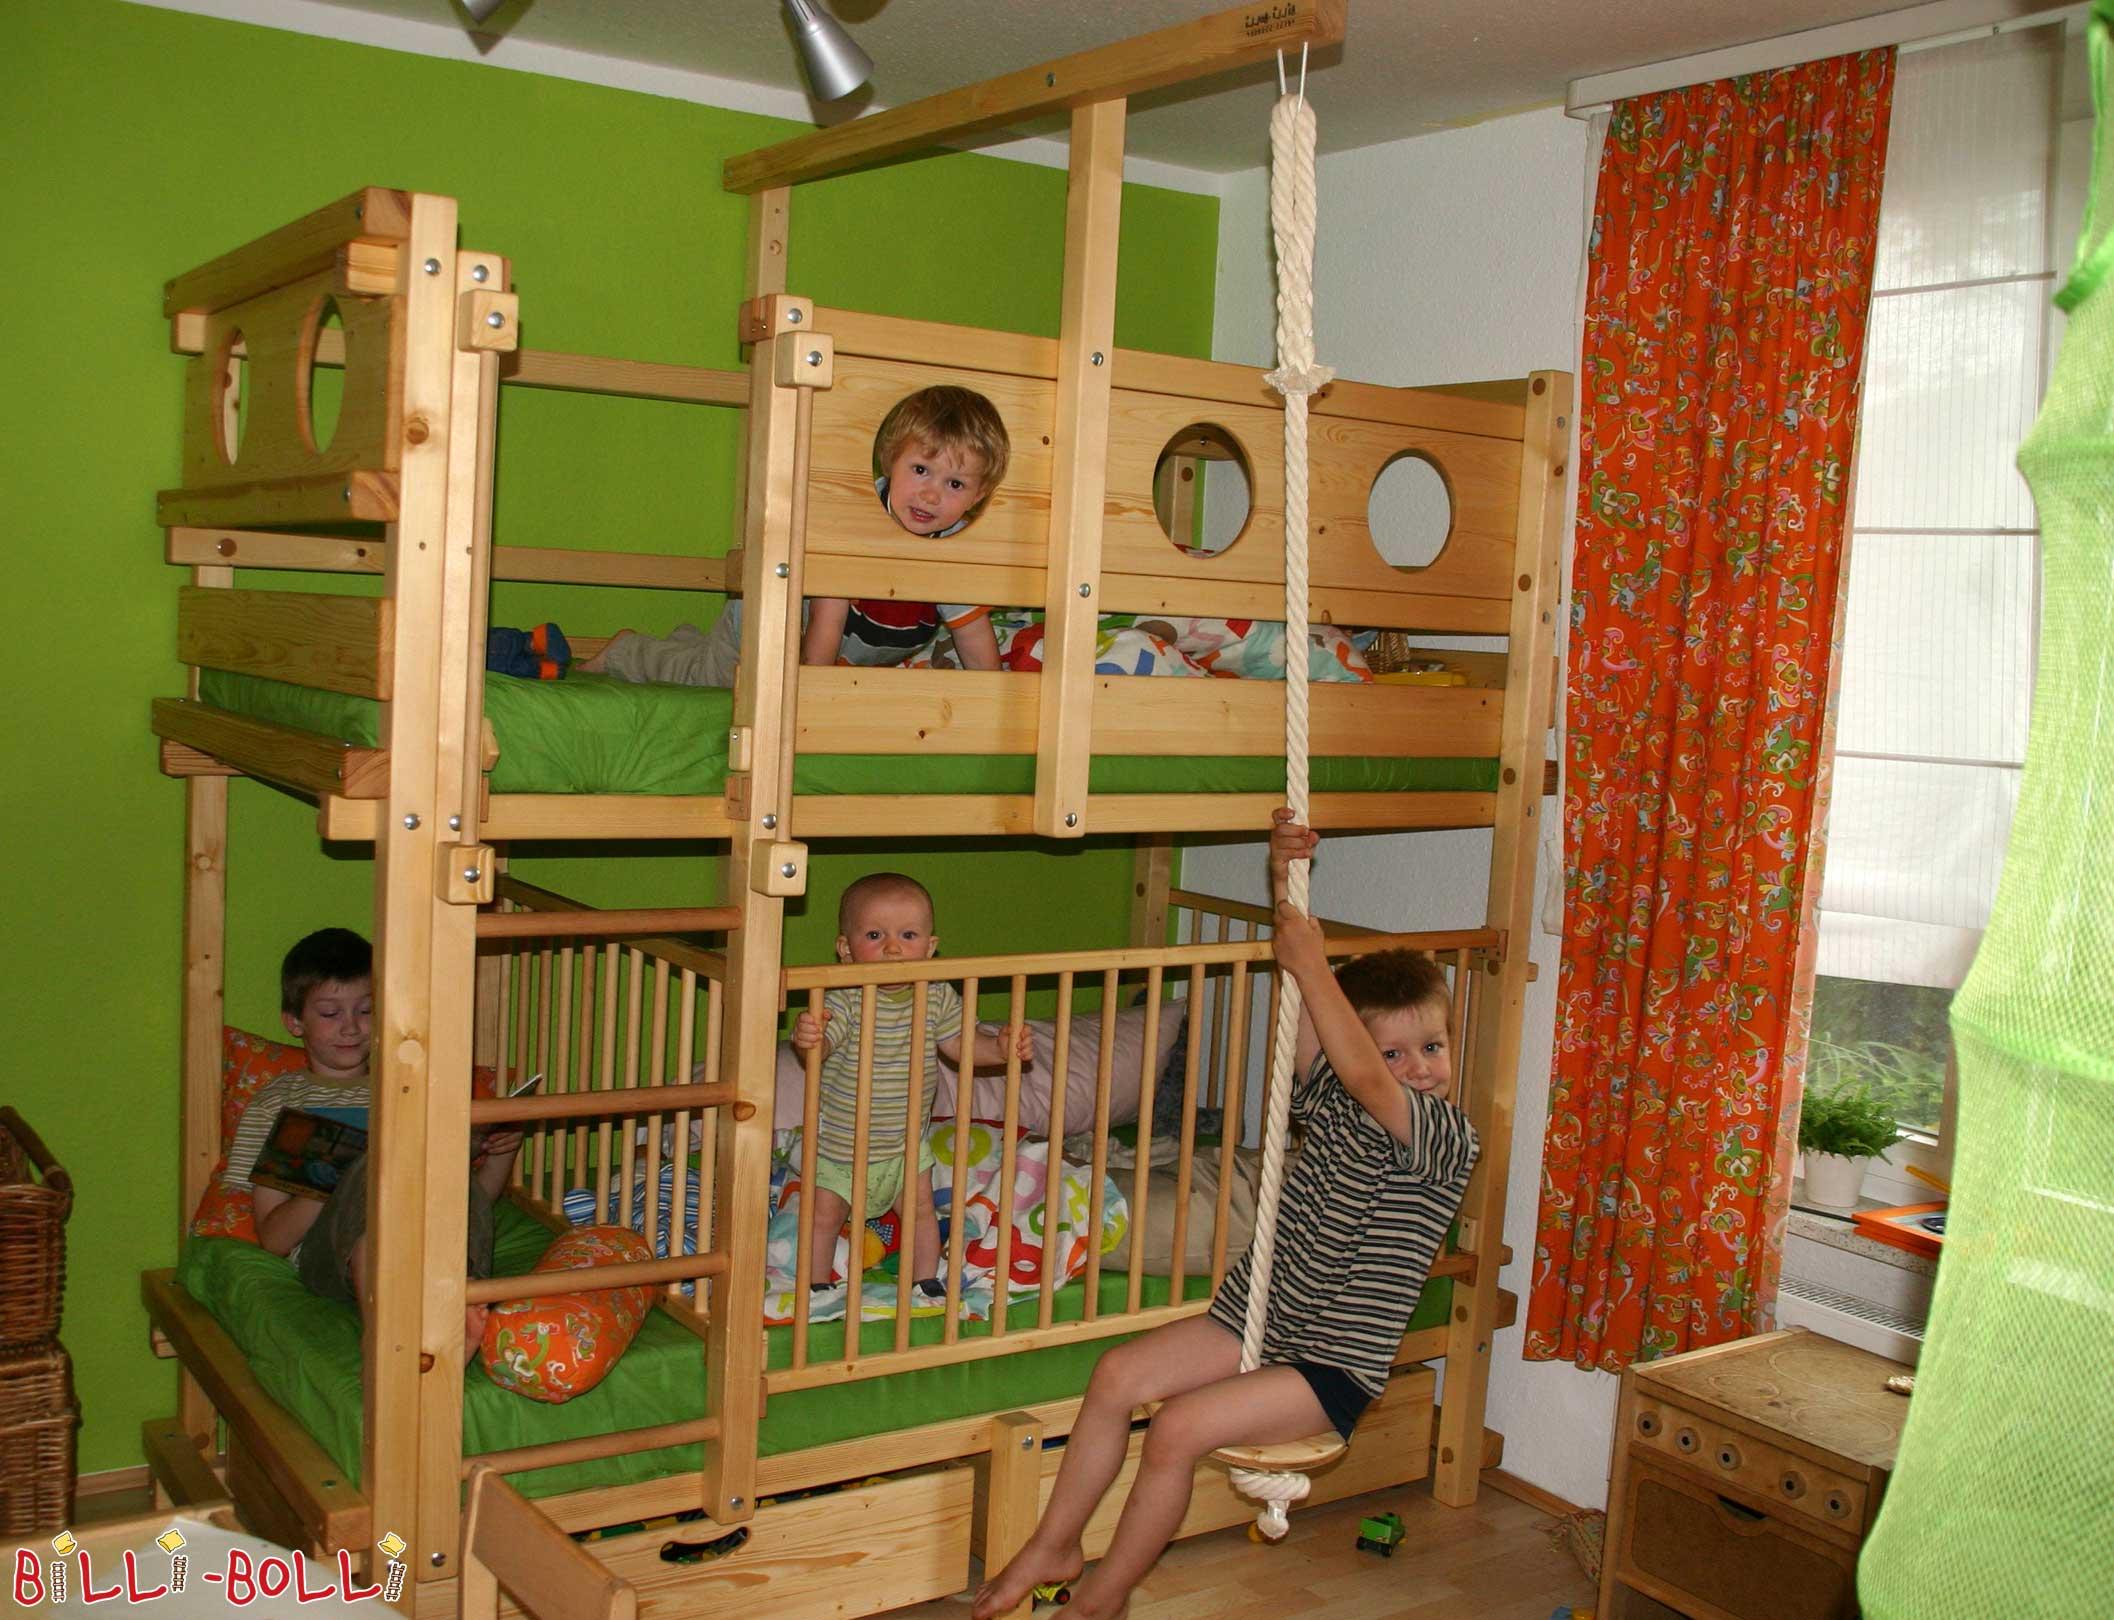 zur sicherheit billi bolli kinderm bel. Black Bedroom Furniture Sets. Home Design Ideas